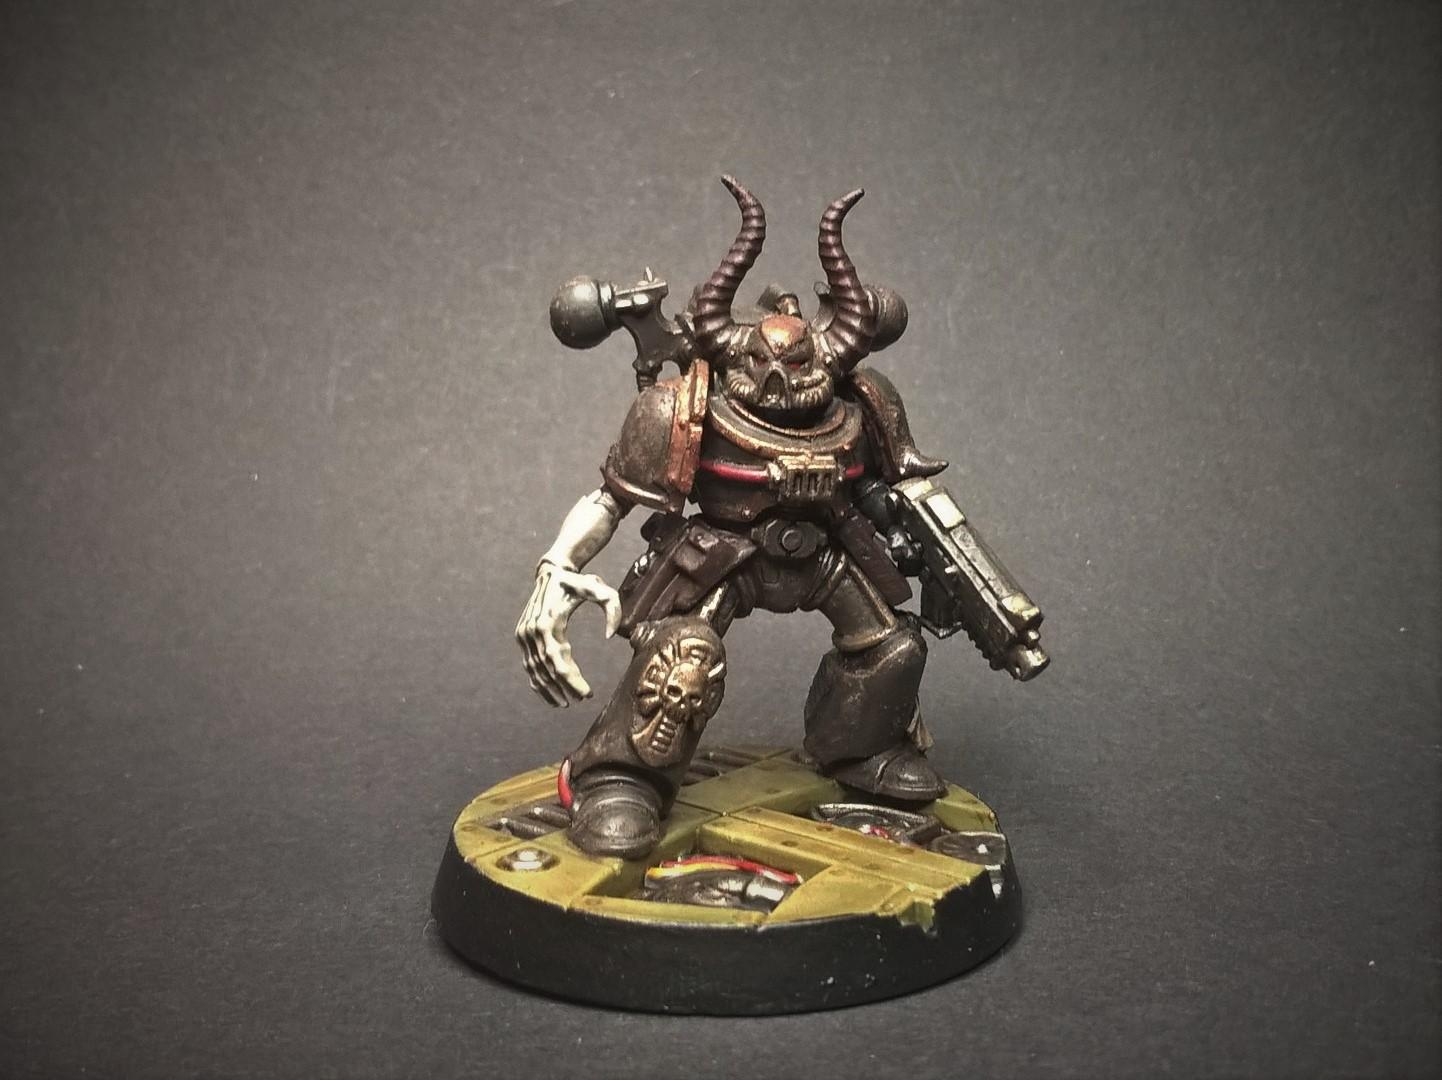 Black Legion, Chaos, Chaos Space Marines, Conversion, True Scale, Warhammer 40,000